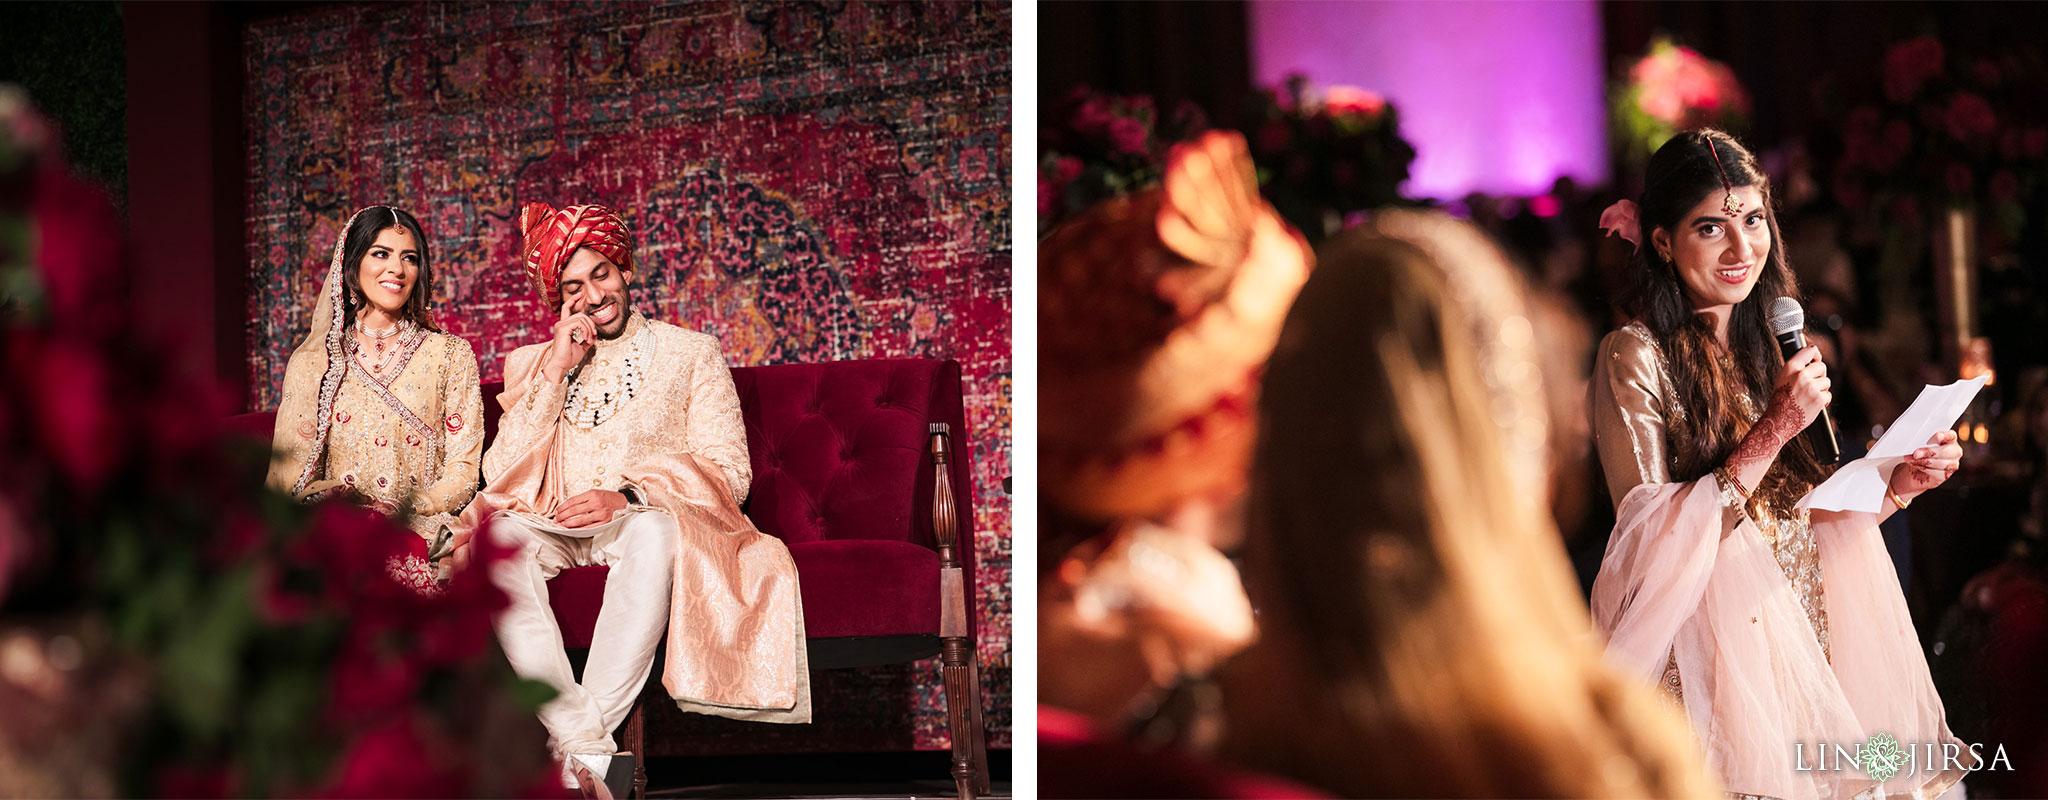 028 four seasons westlake village muslim wedding photography